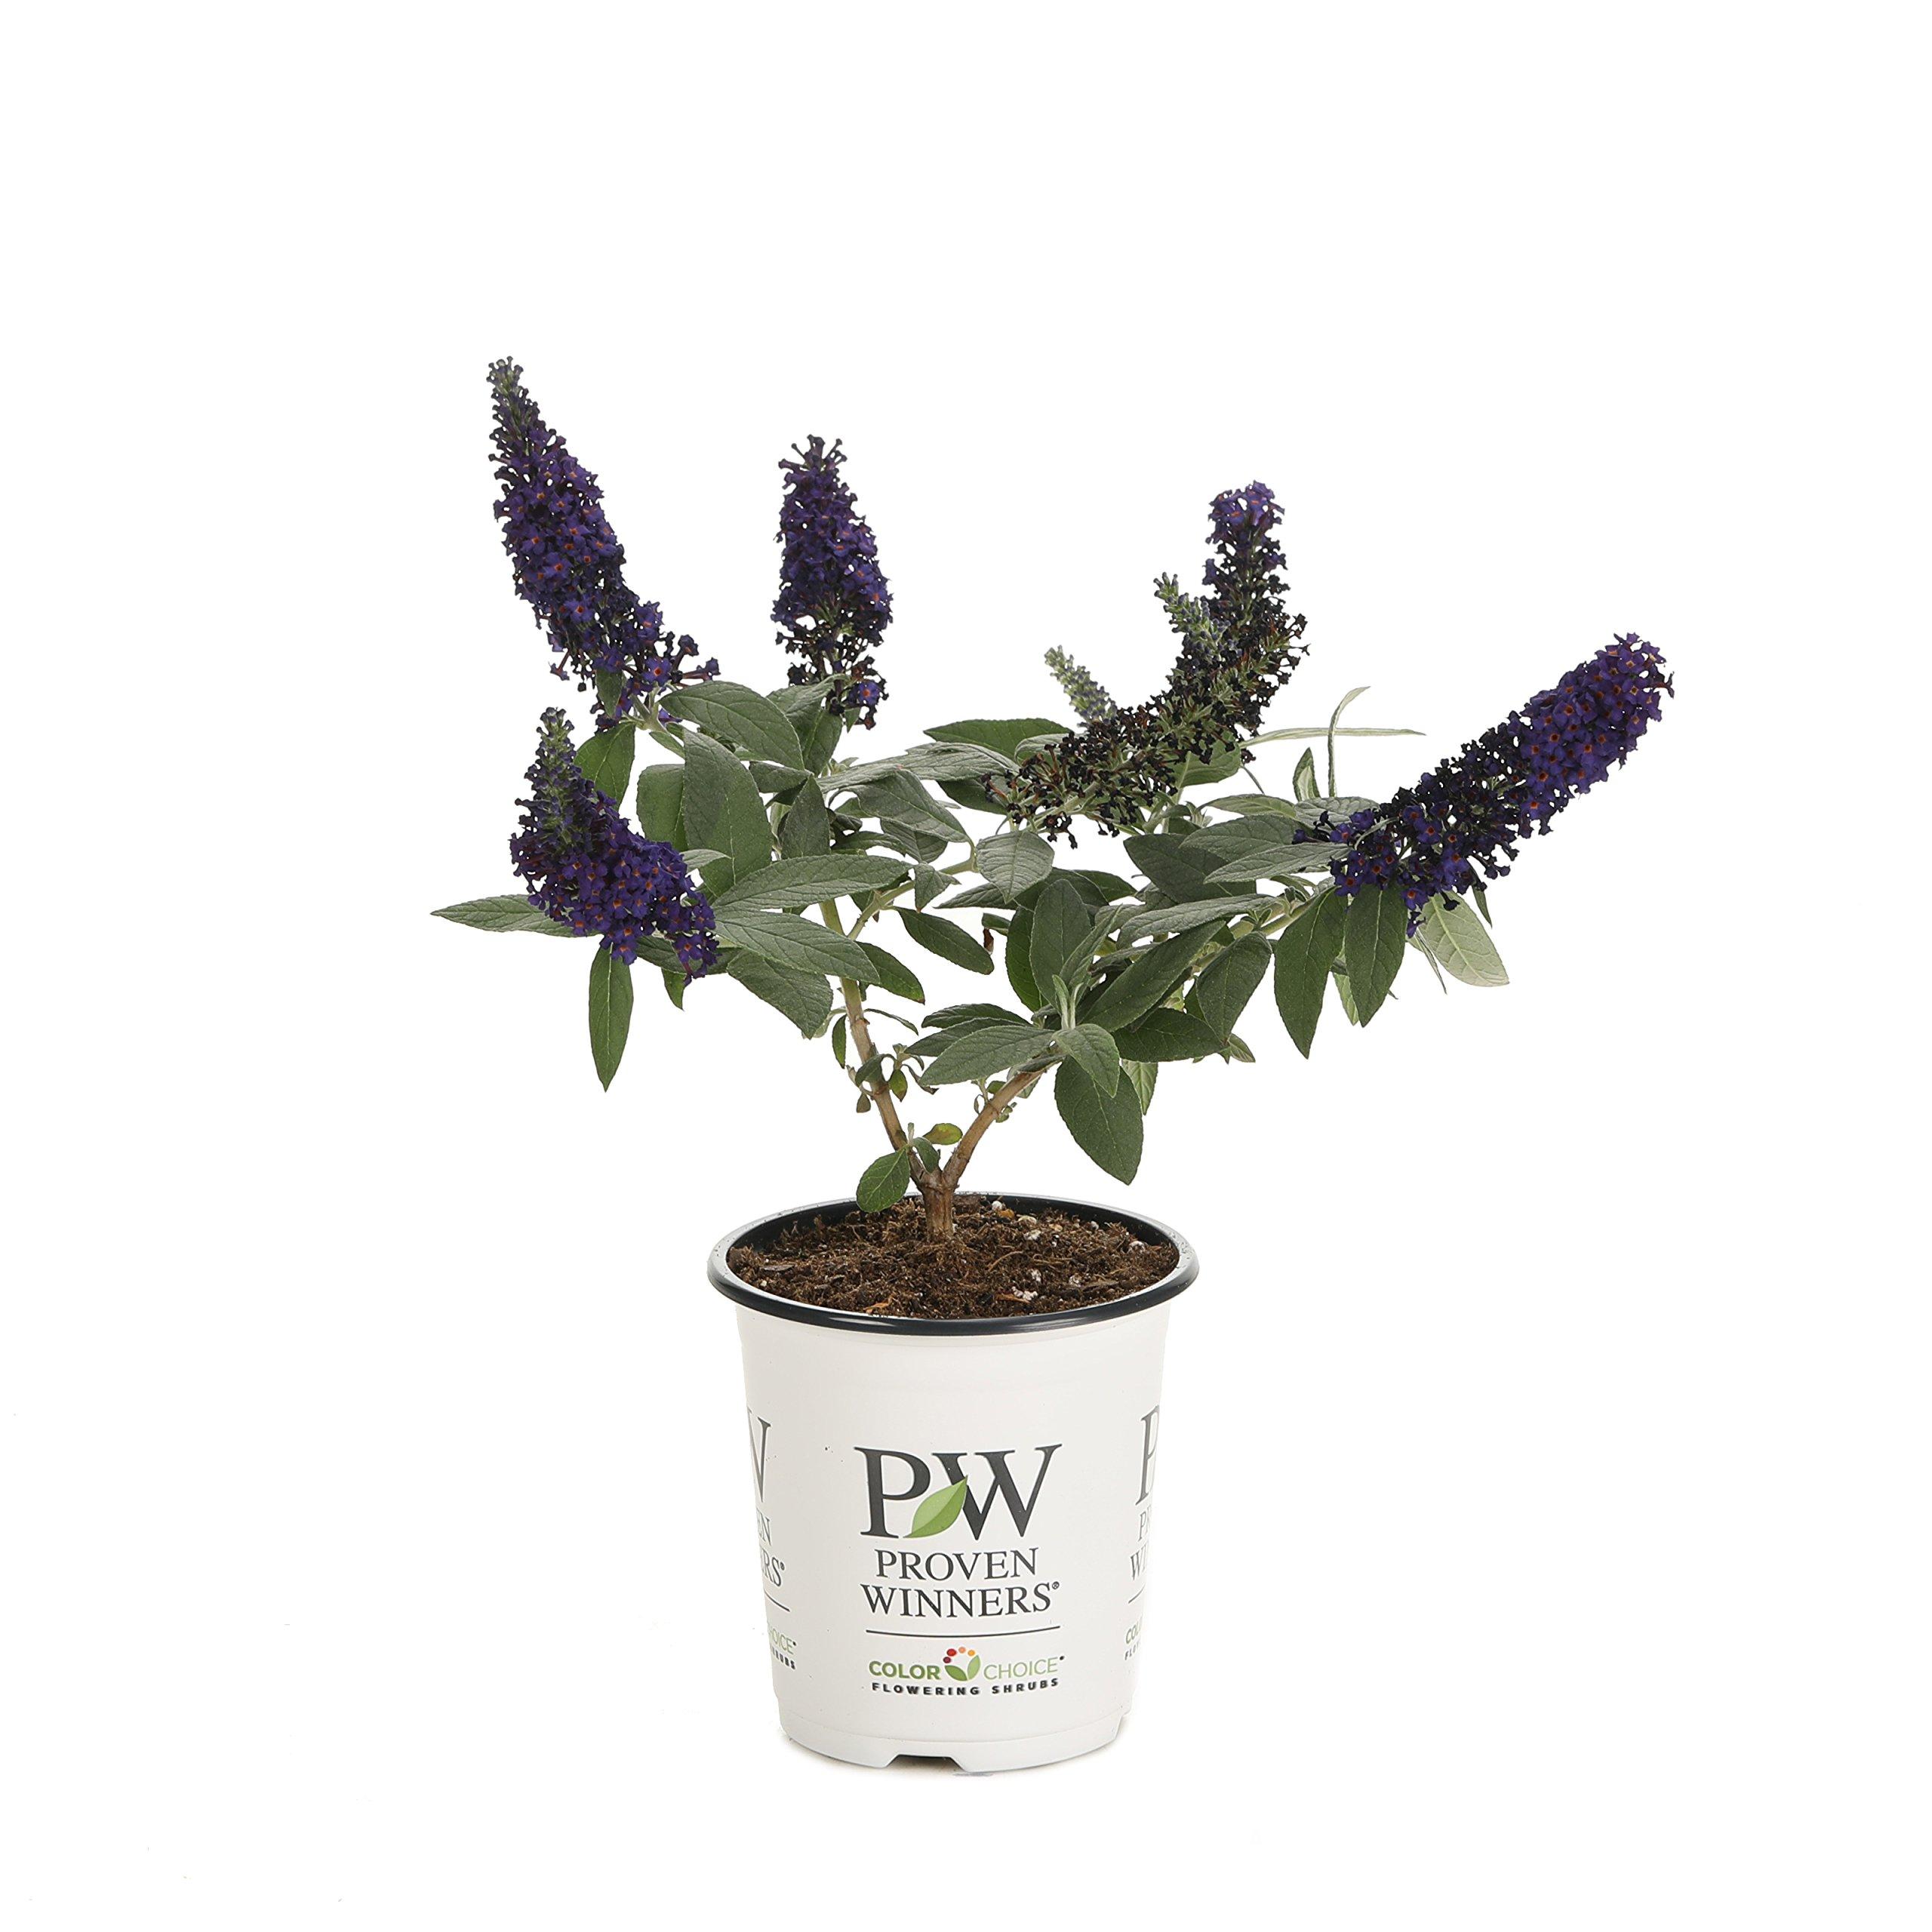 Pugster Blue Butterfly Bush (Buddleia) Live Shrub, Blue Flowers, 4.5 in. Quart